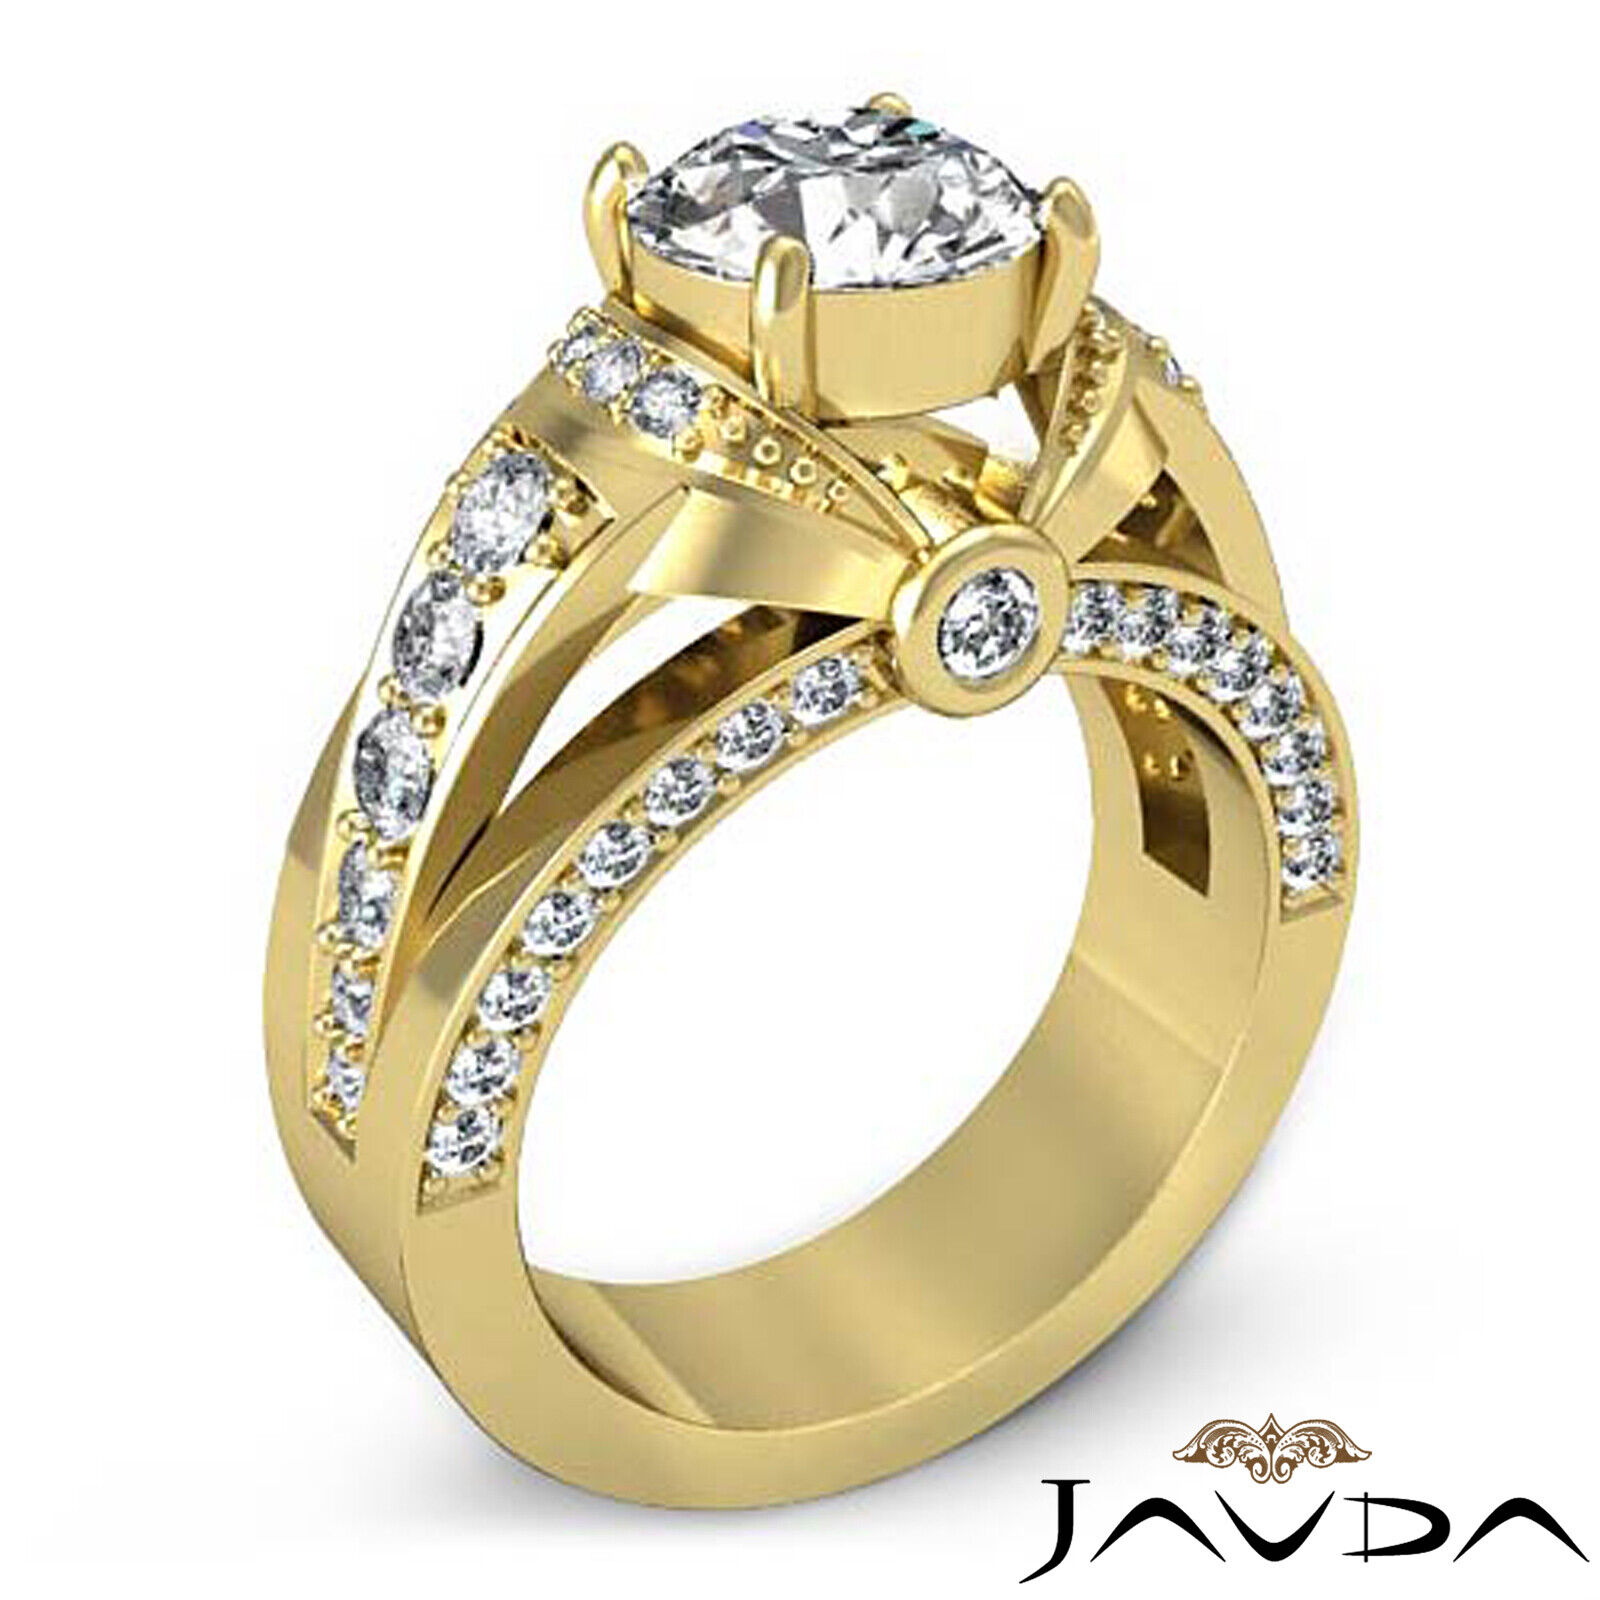 1.7ct Knot Classic Sidestone Round Diamond Engagement Ring GIA H-VVS2 White Gold 8